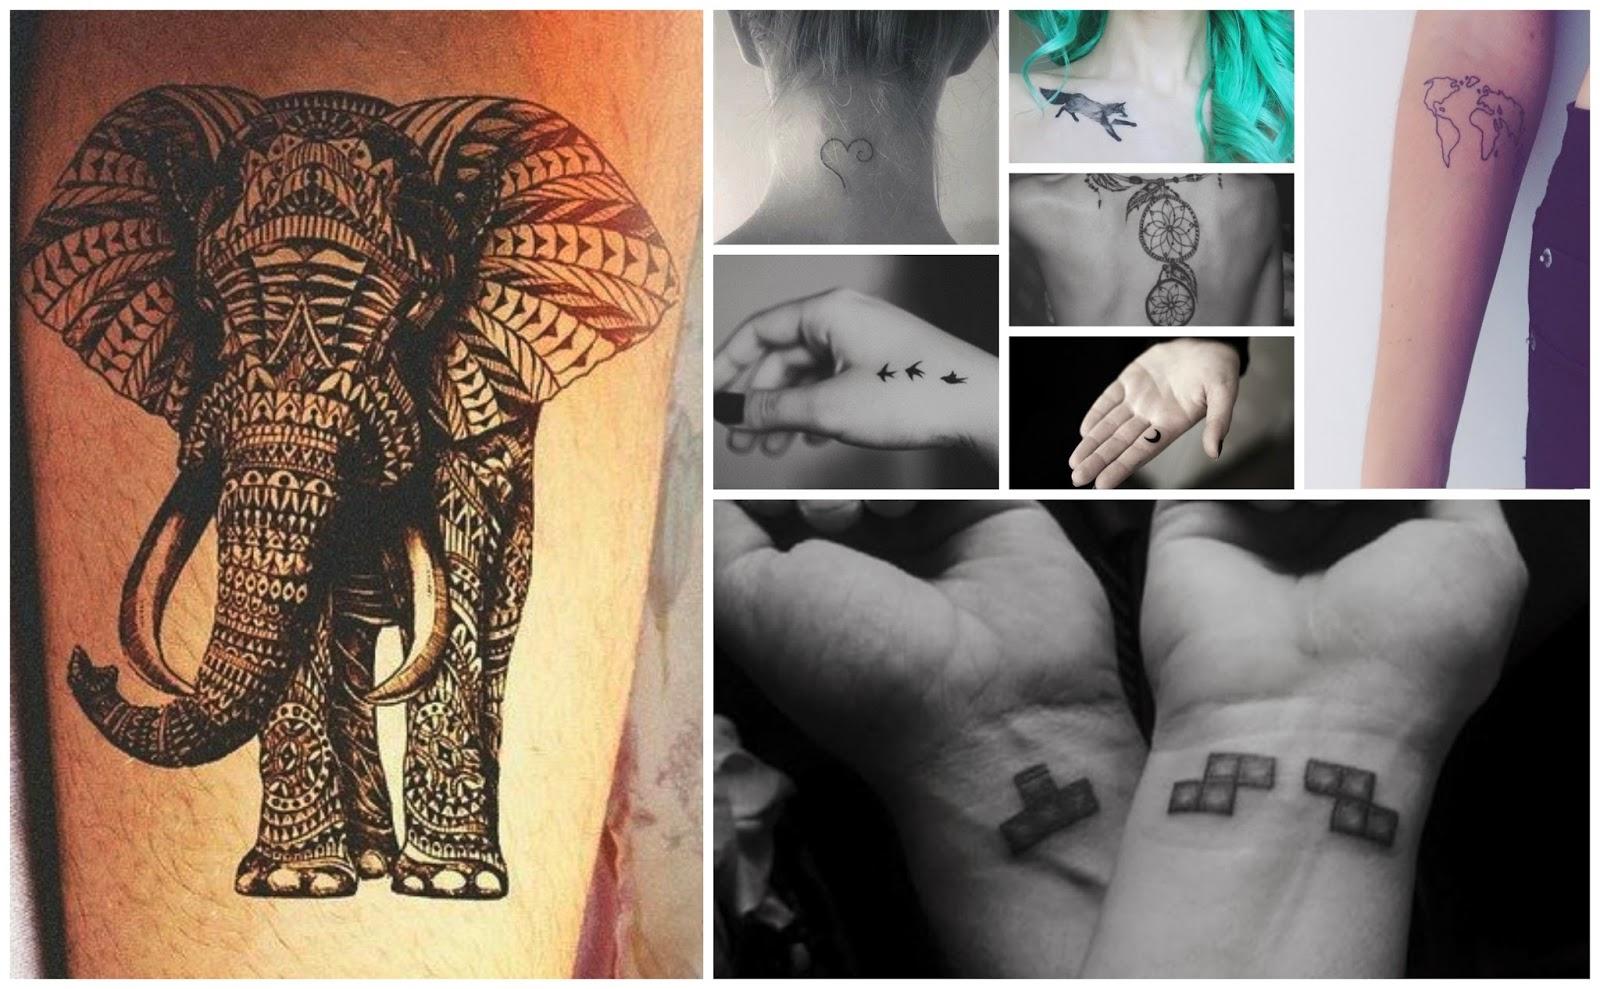 tatoveringer inspiration